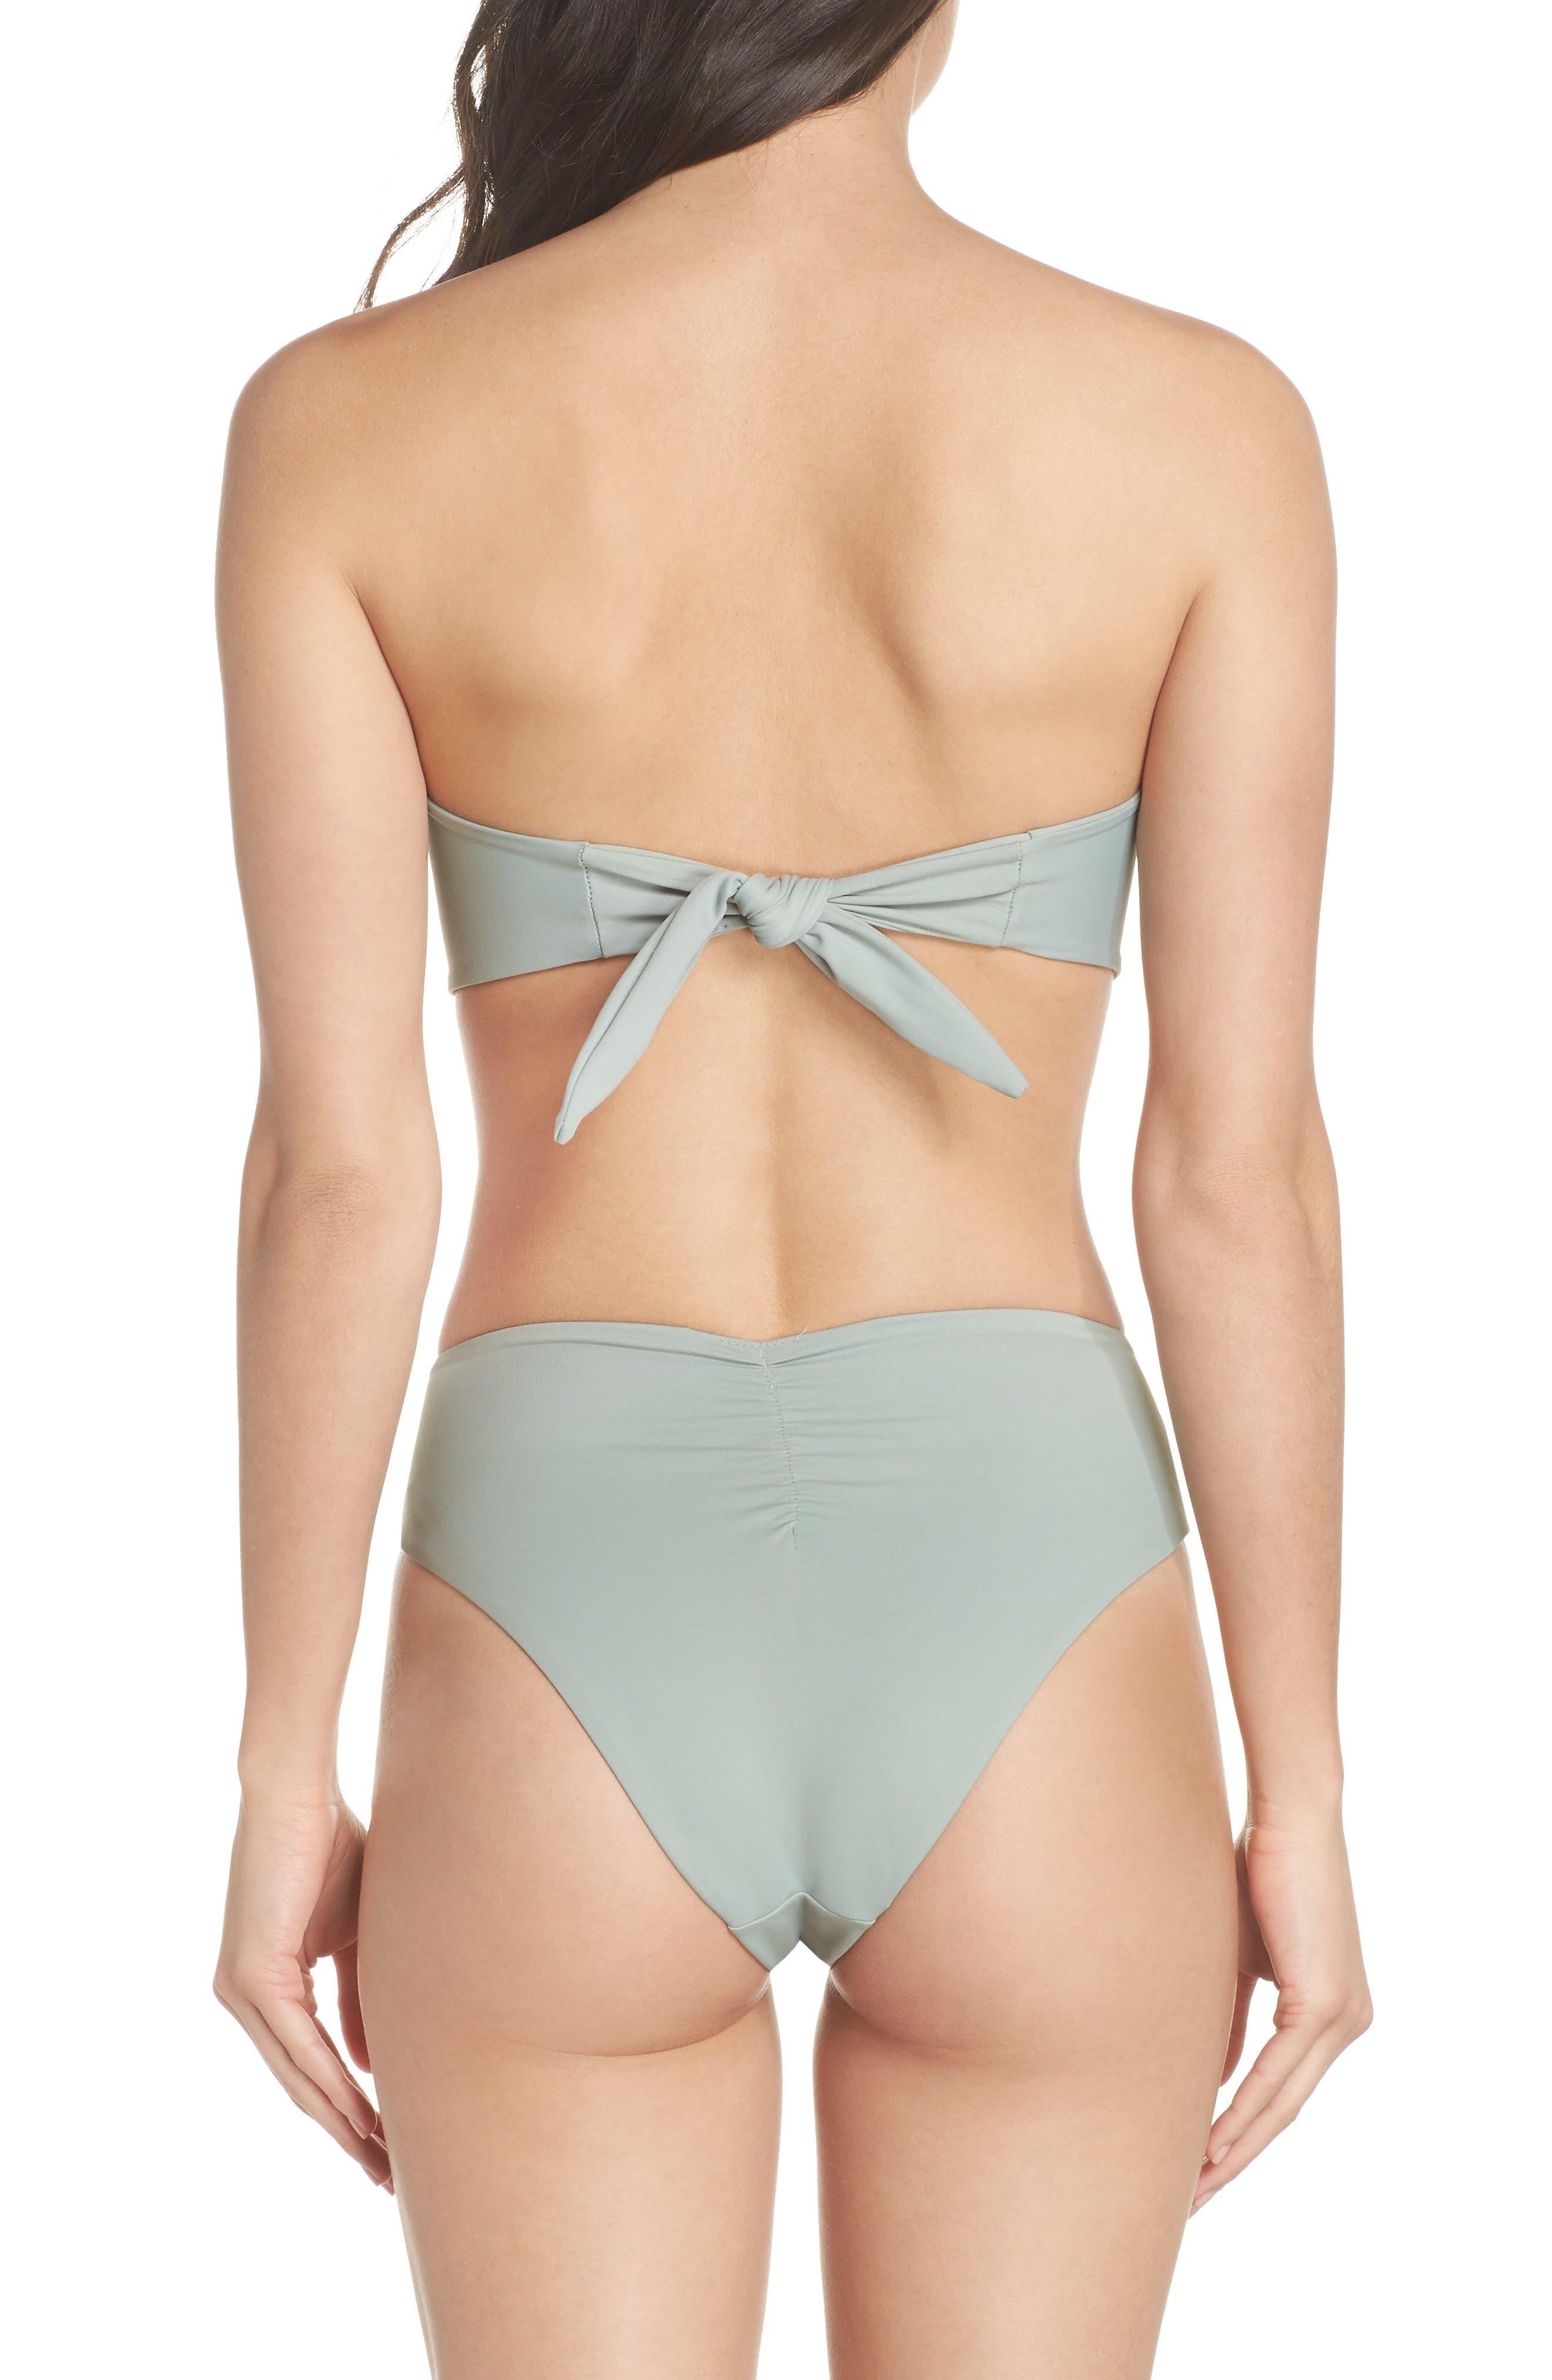 Cabana Bikini Top,                             Alternate thumbnail 9, color,                             PISTACHE GREEN